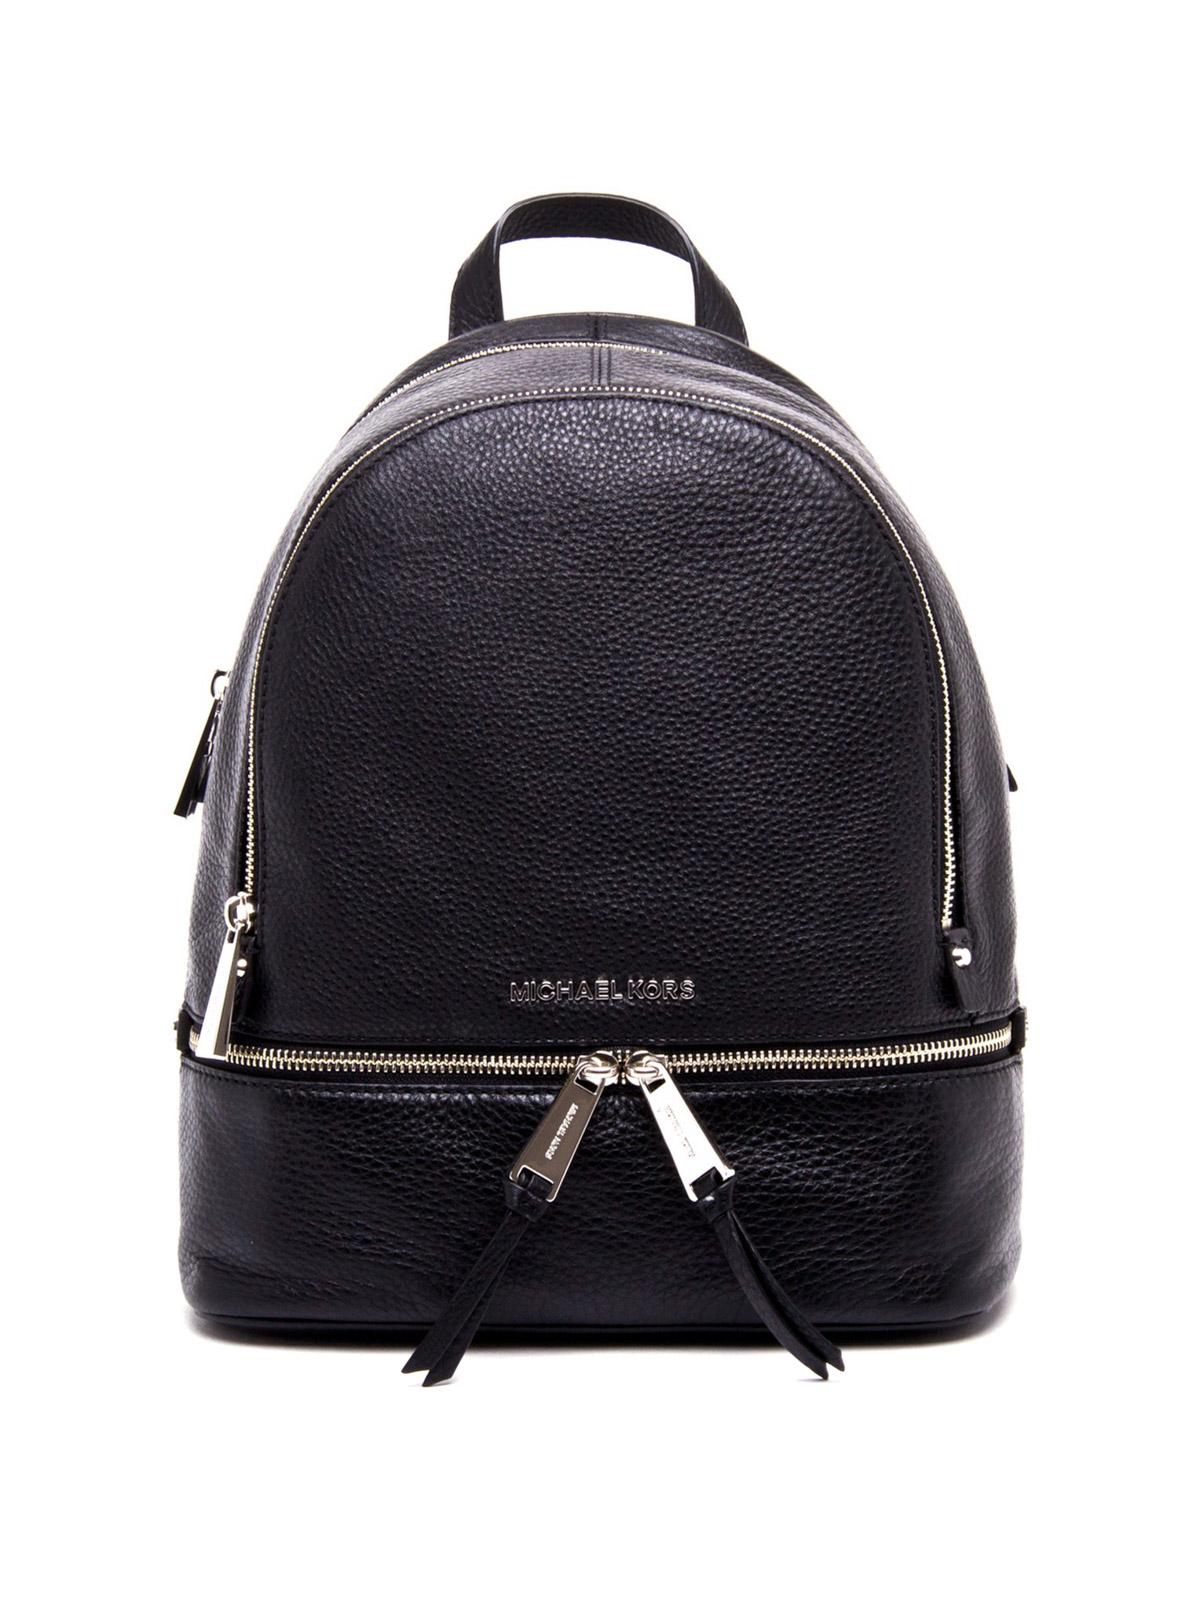 rhea small leather backpack by michael kors backpacks ikrix. Black Bedroom Furniture Sets. Home Design Ideas